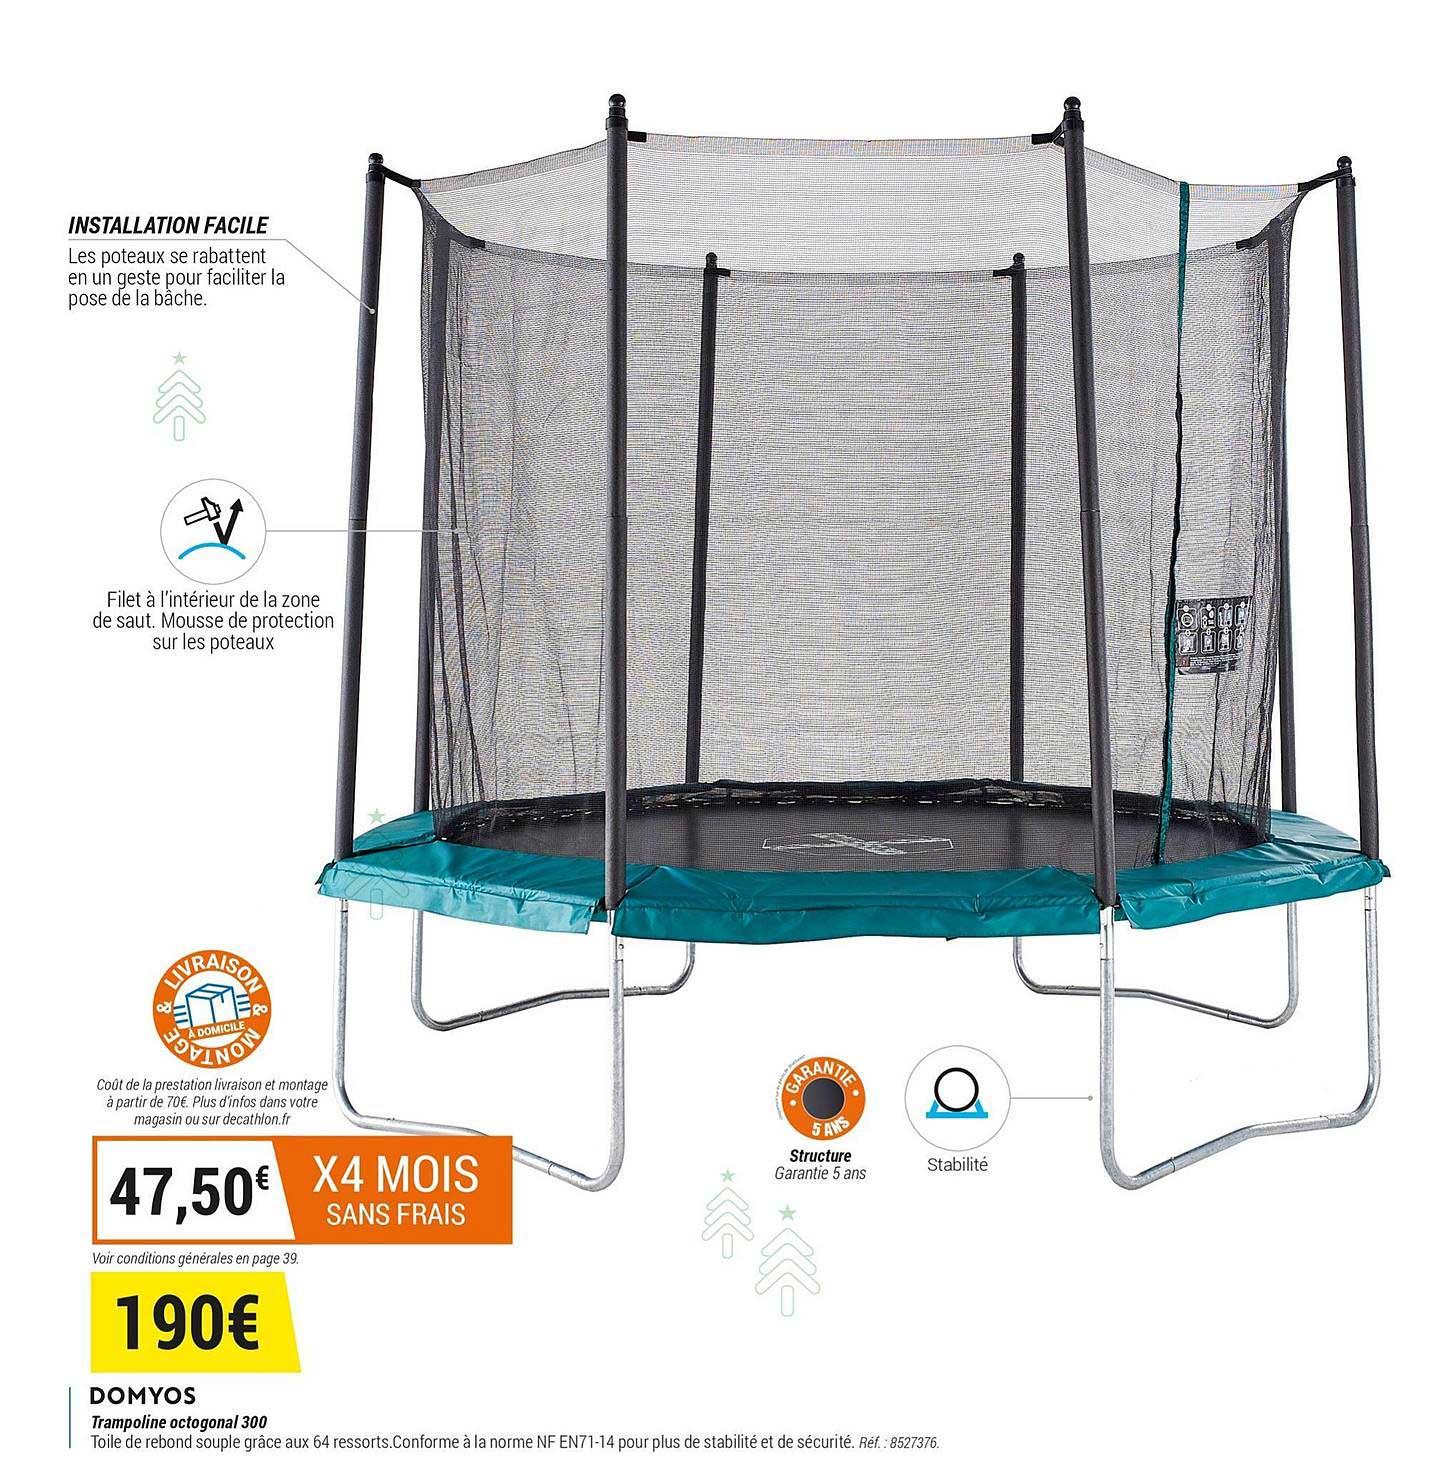 korelacijska memorija zrakoplovne kompanije domyos trampoline